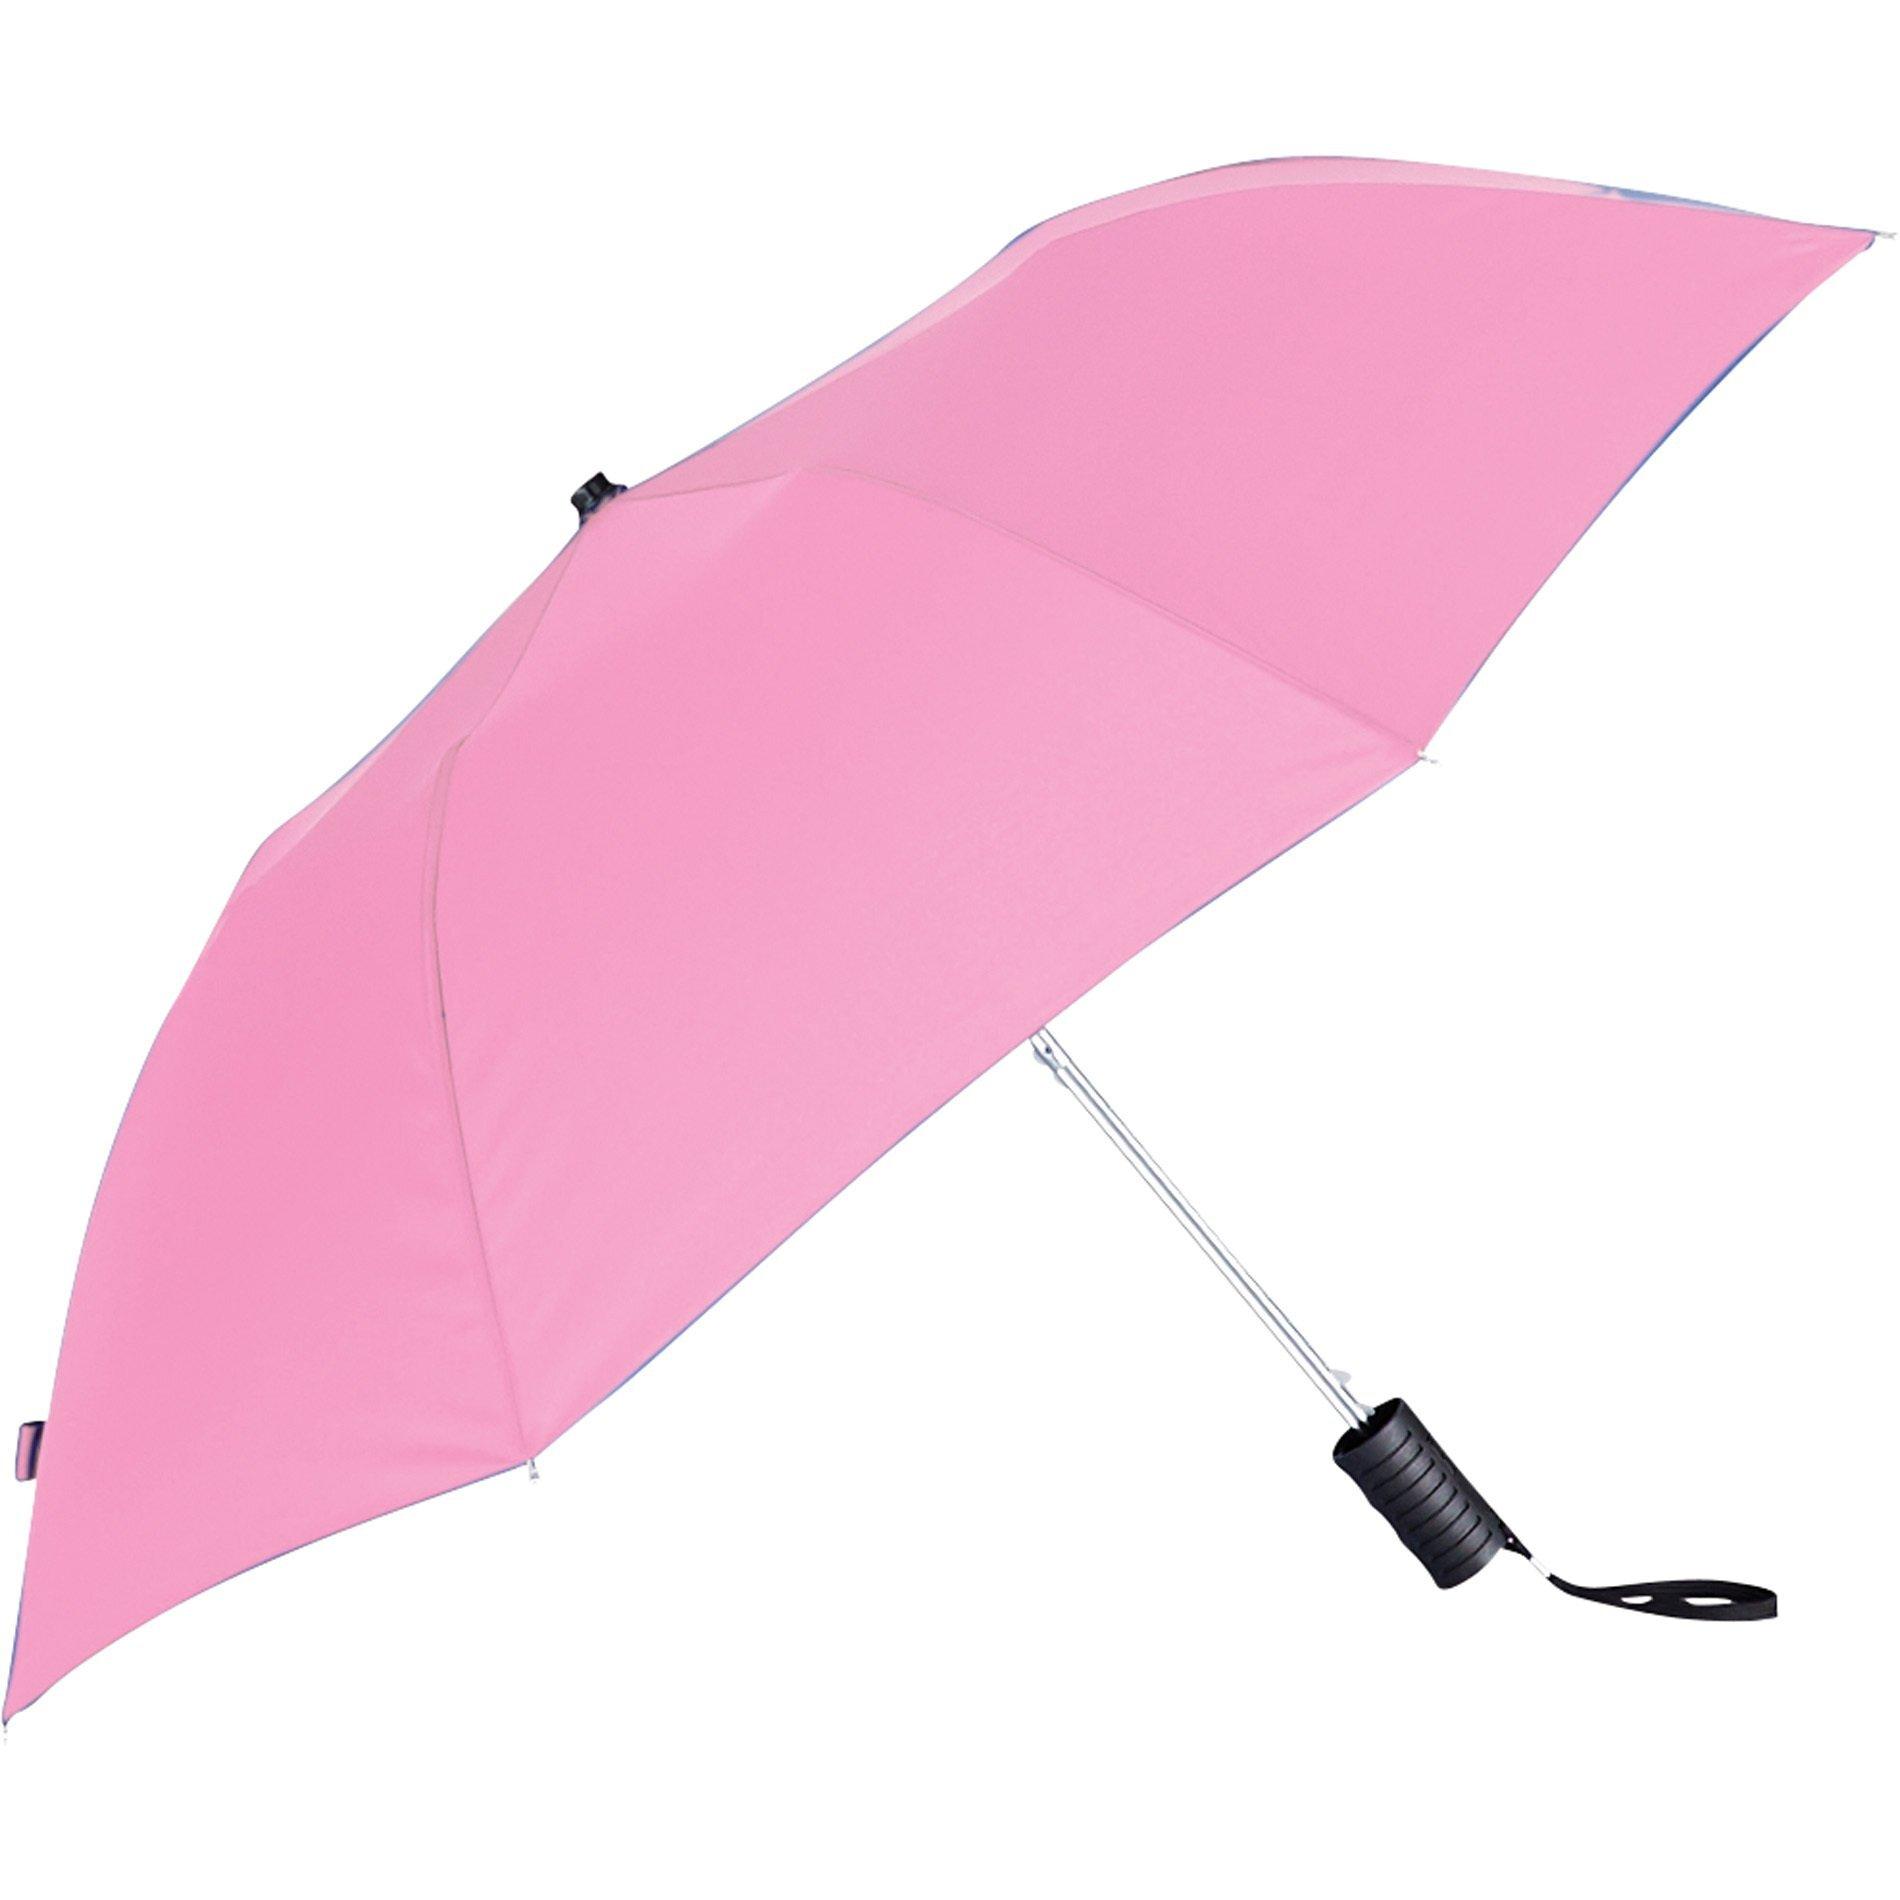 "Compact Auto Folding Umbrella, 42"" Arc"